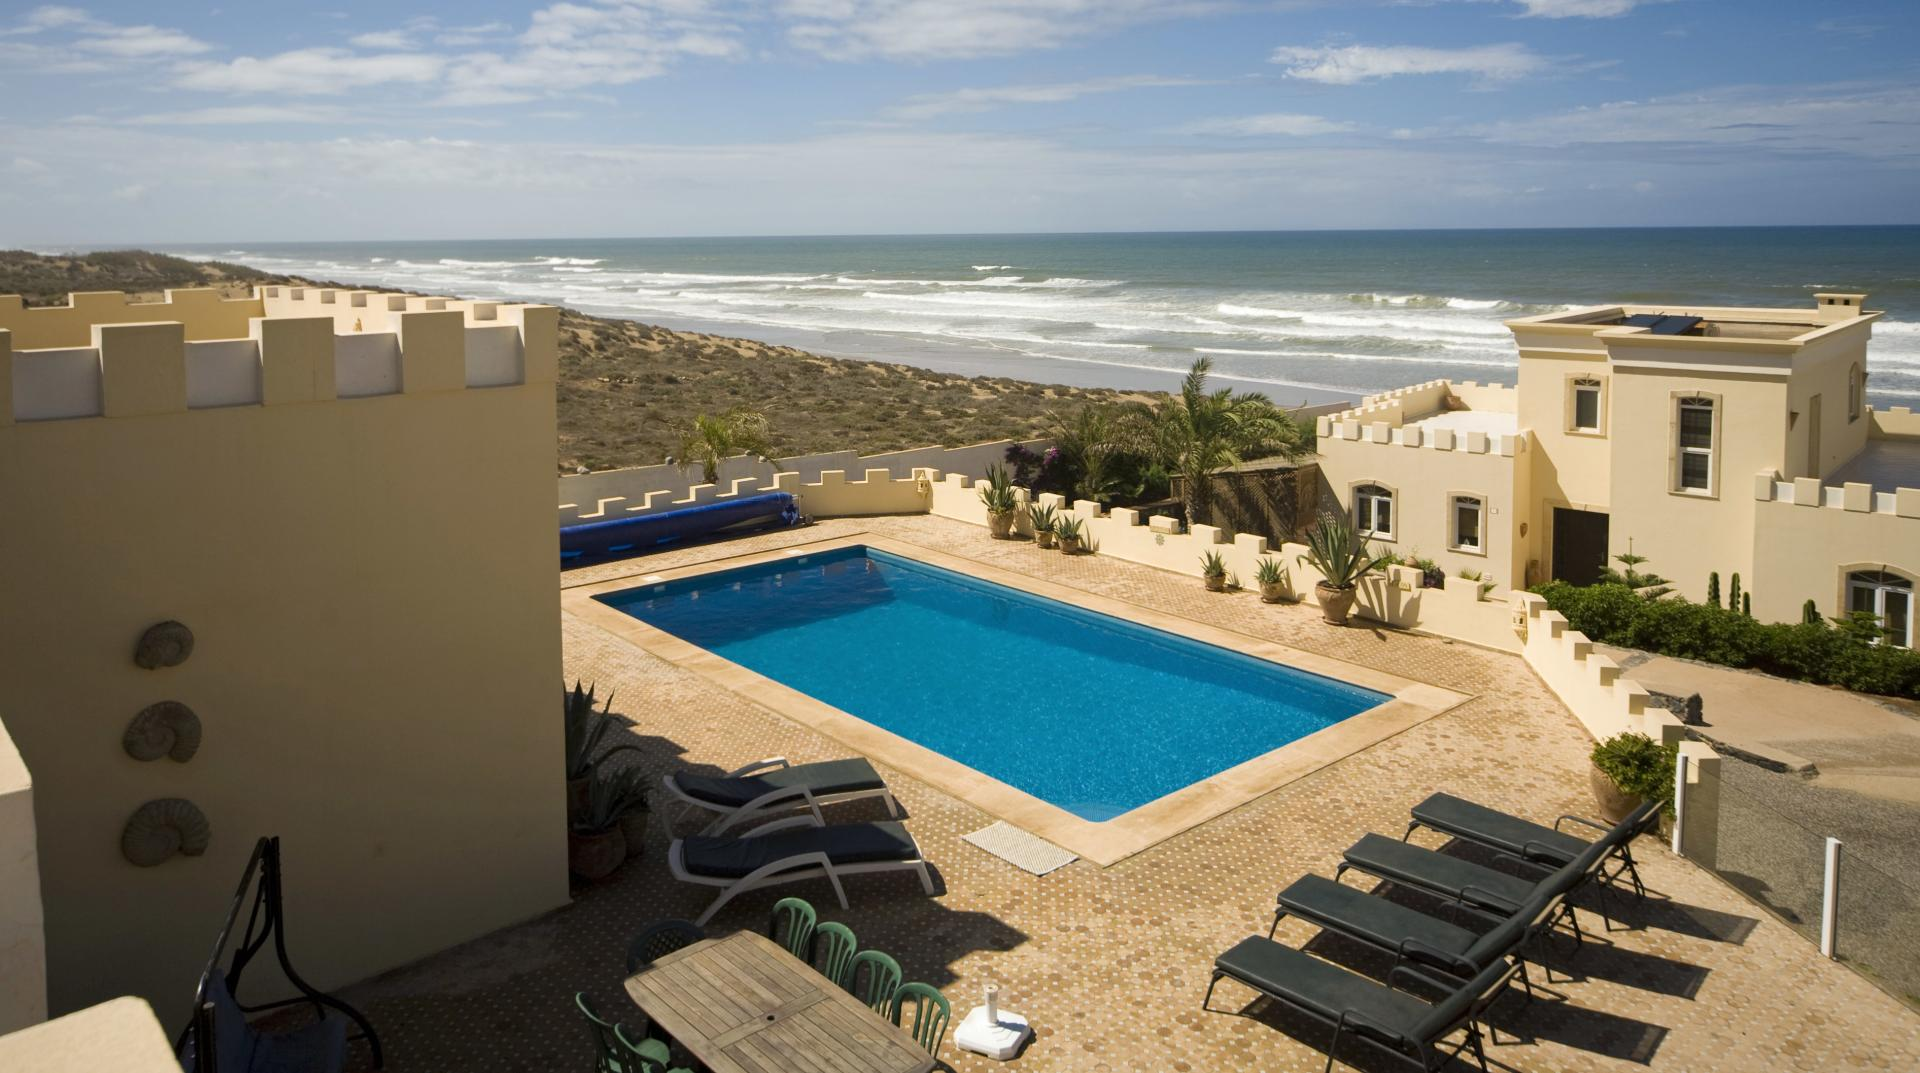 Outdoor Pool 3, Dar l'Oussia, Agadir, Aglou Plage.